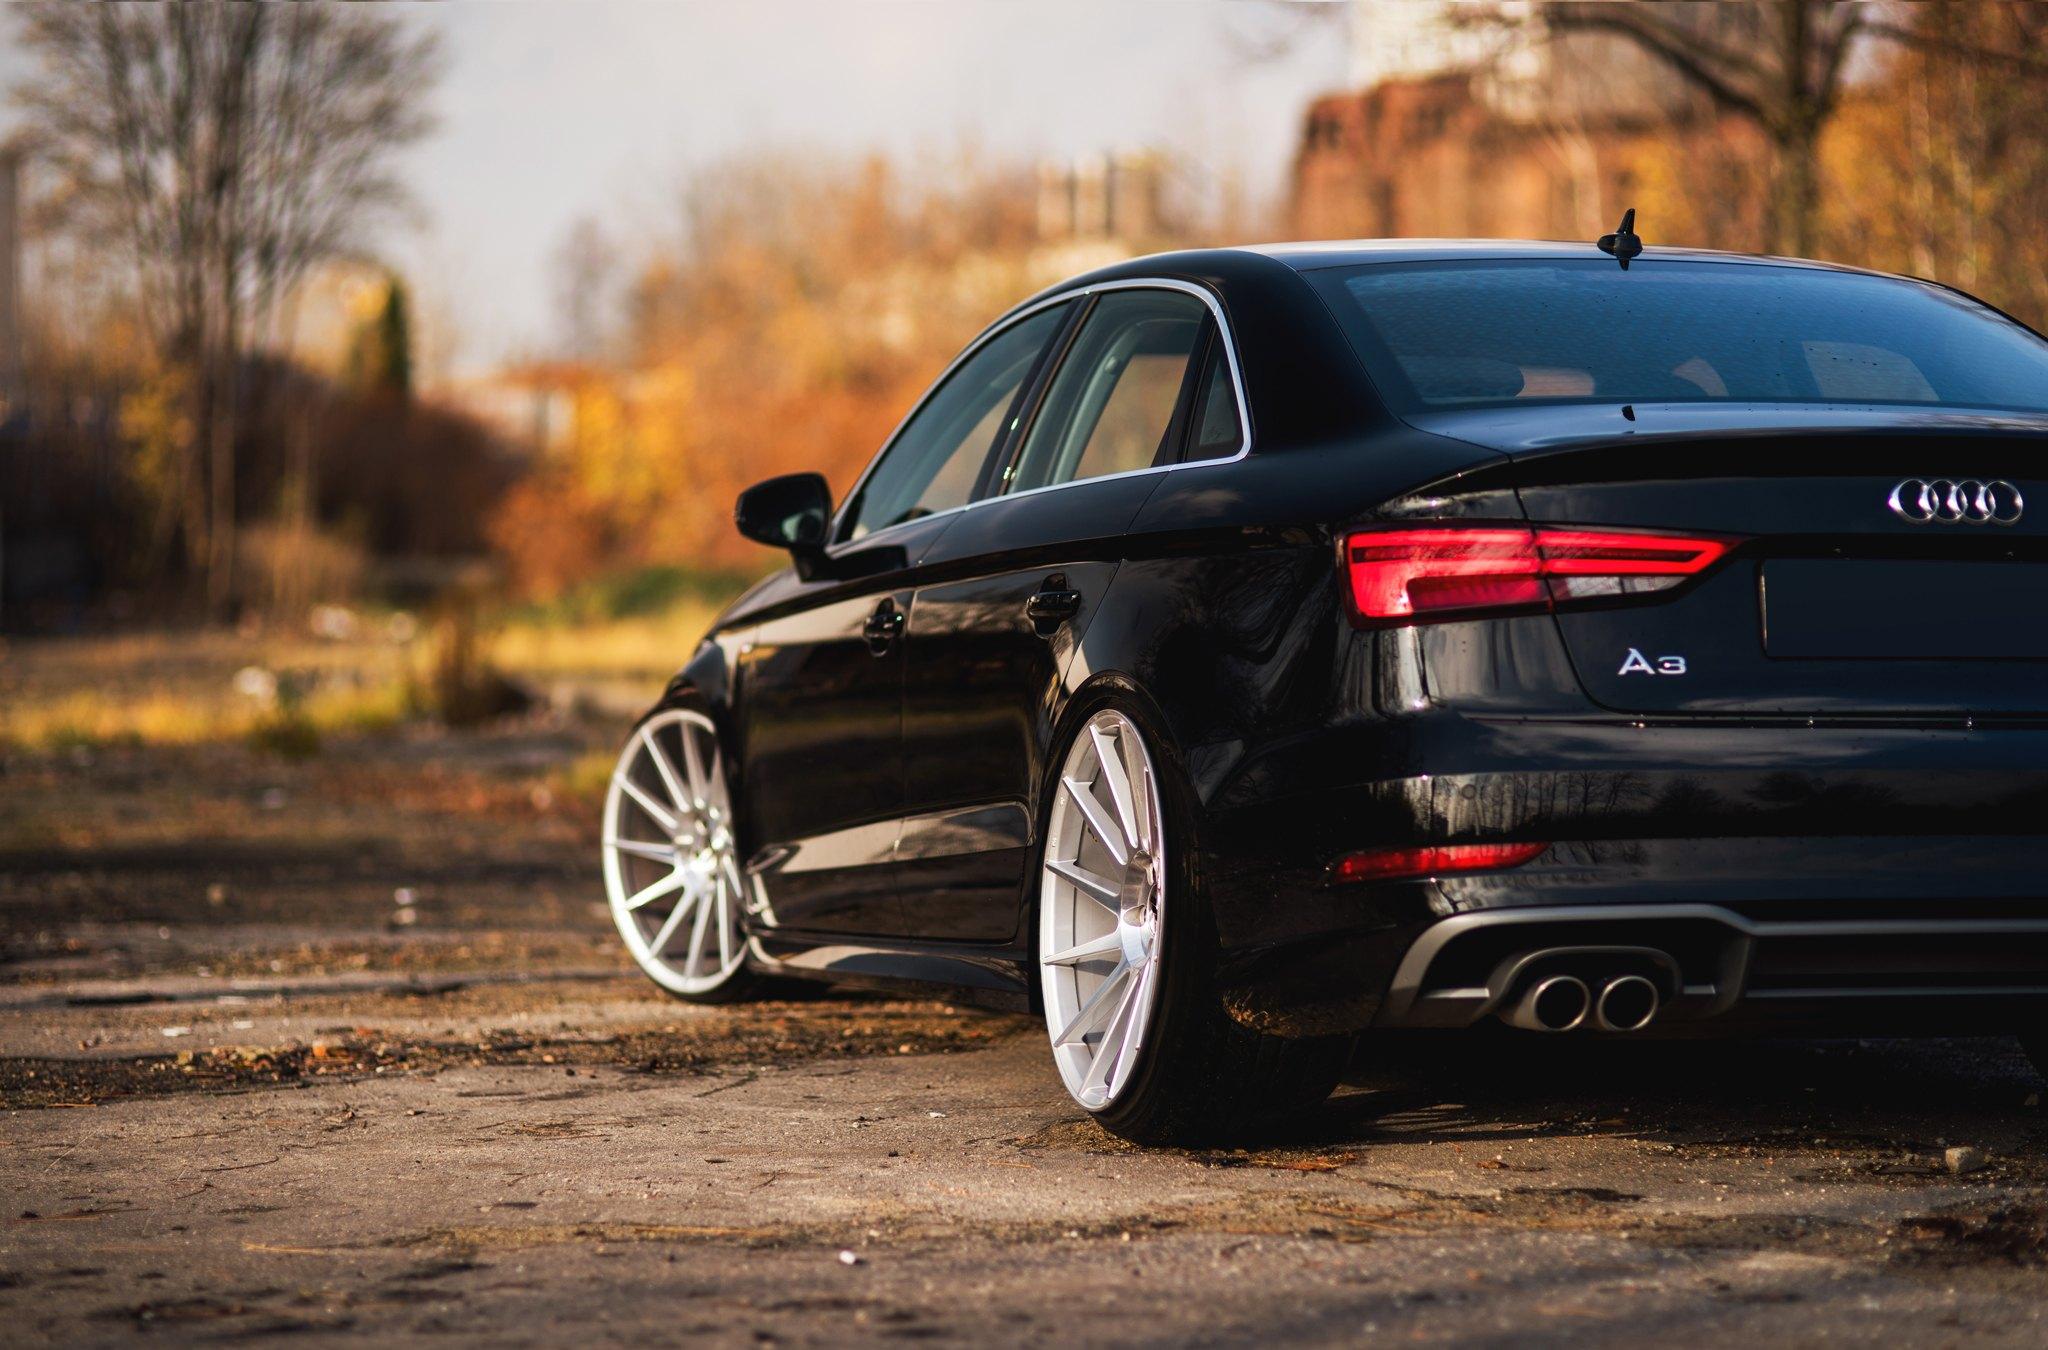 2015 Audi S3 2.0T quattro S tronic | Savage On Wheels  |Audi A3 Sedan Black Rims